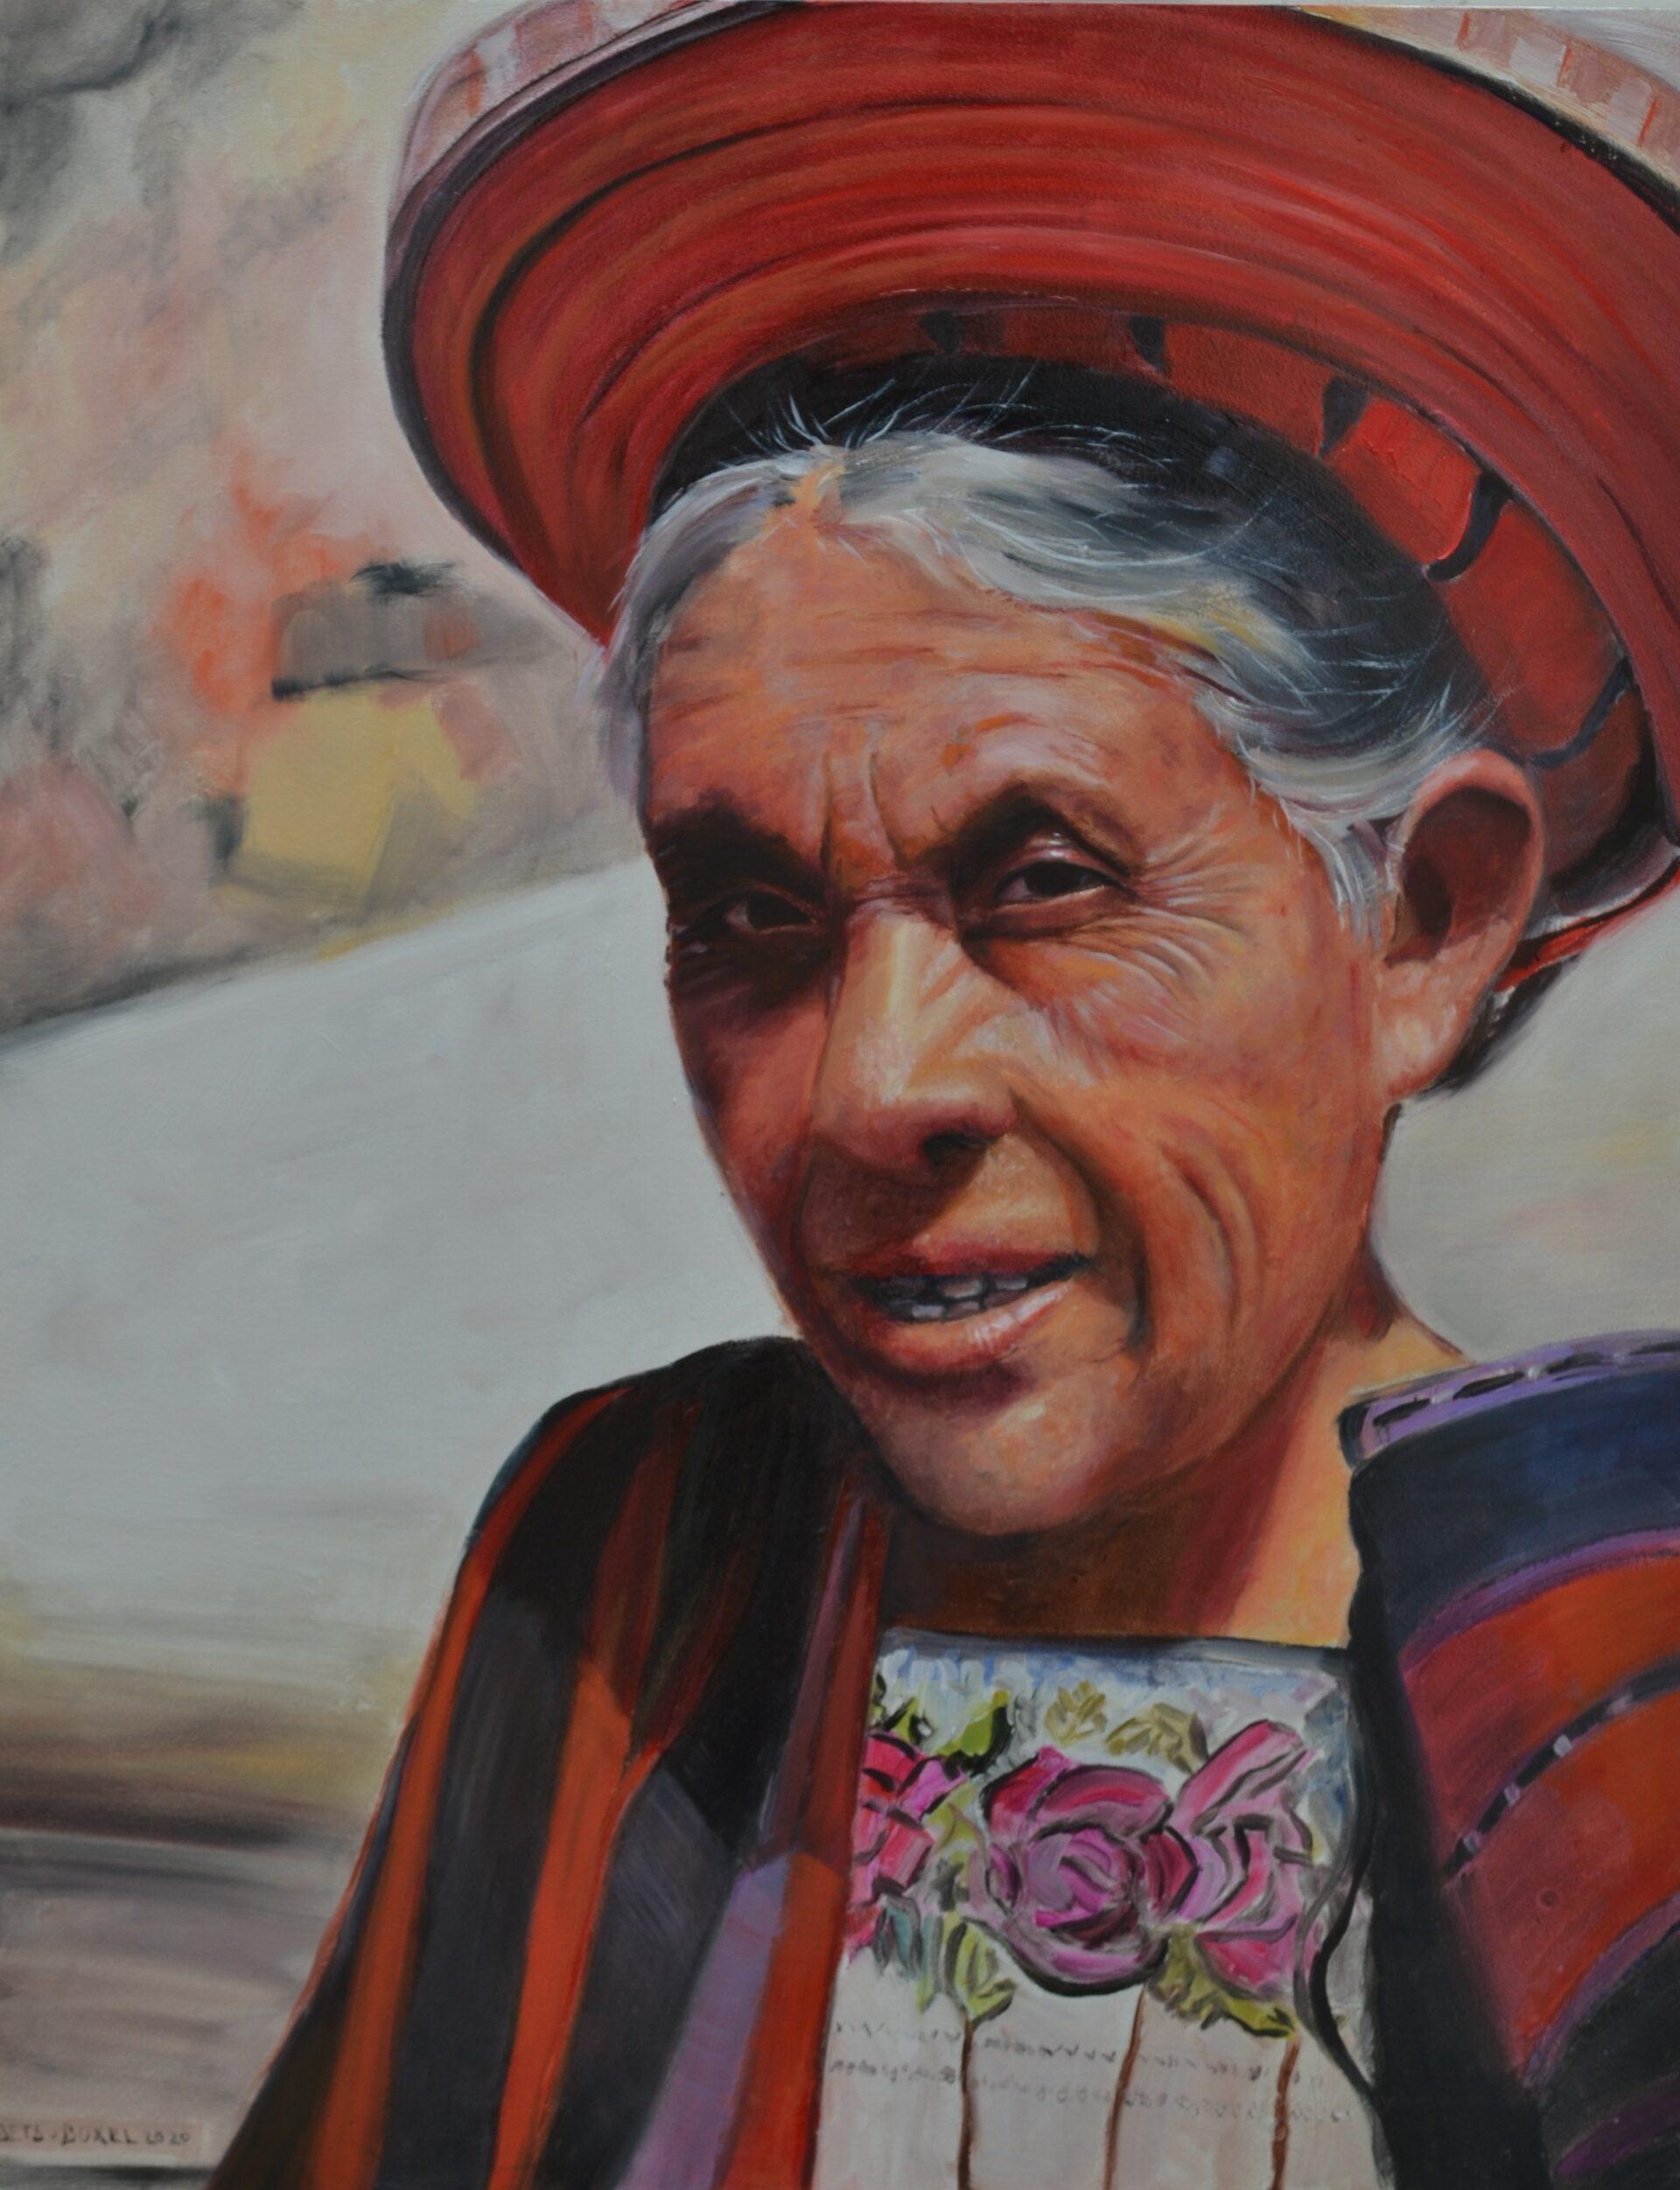 vrouwtje uit guatemala 2020